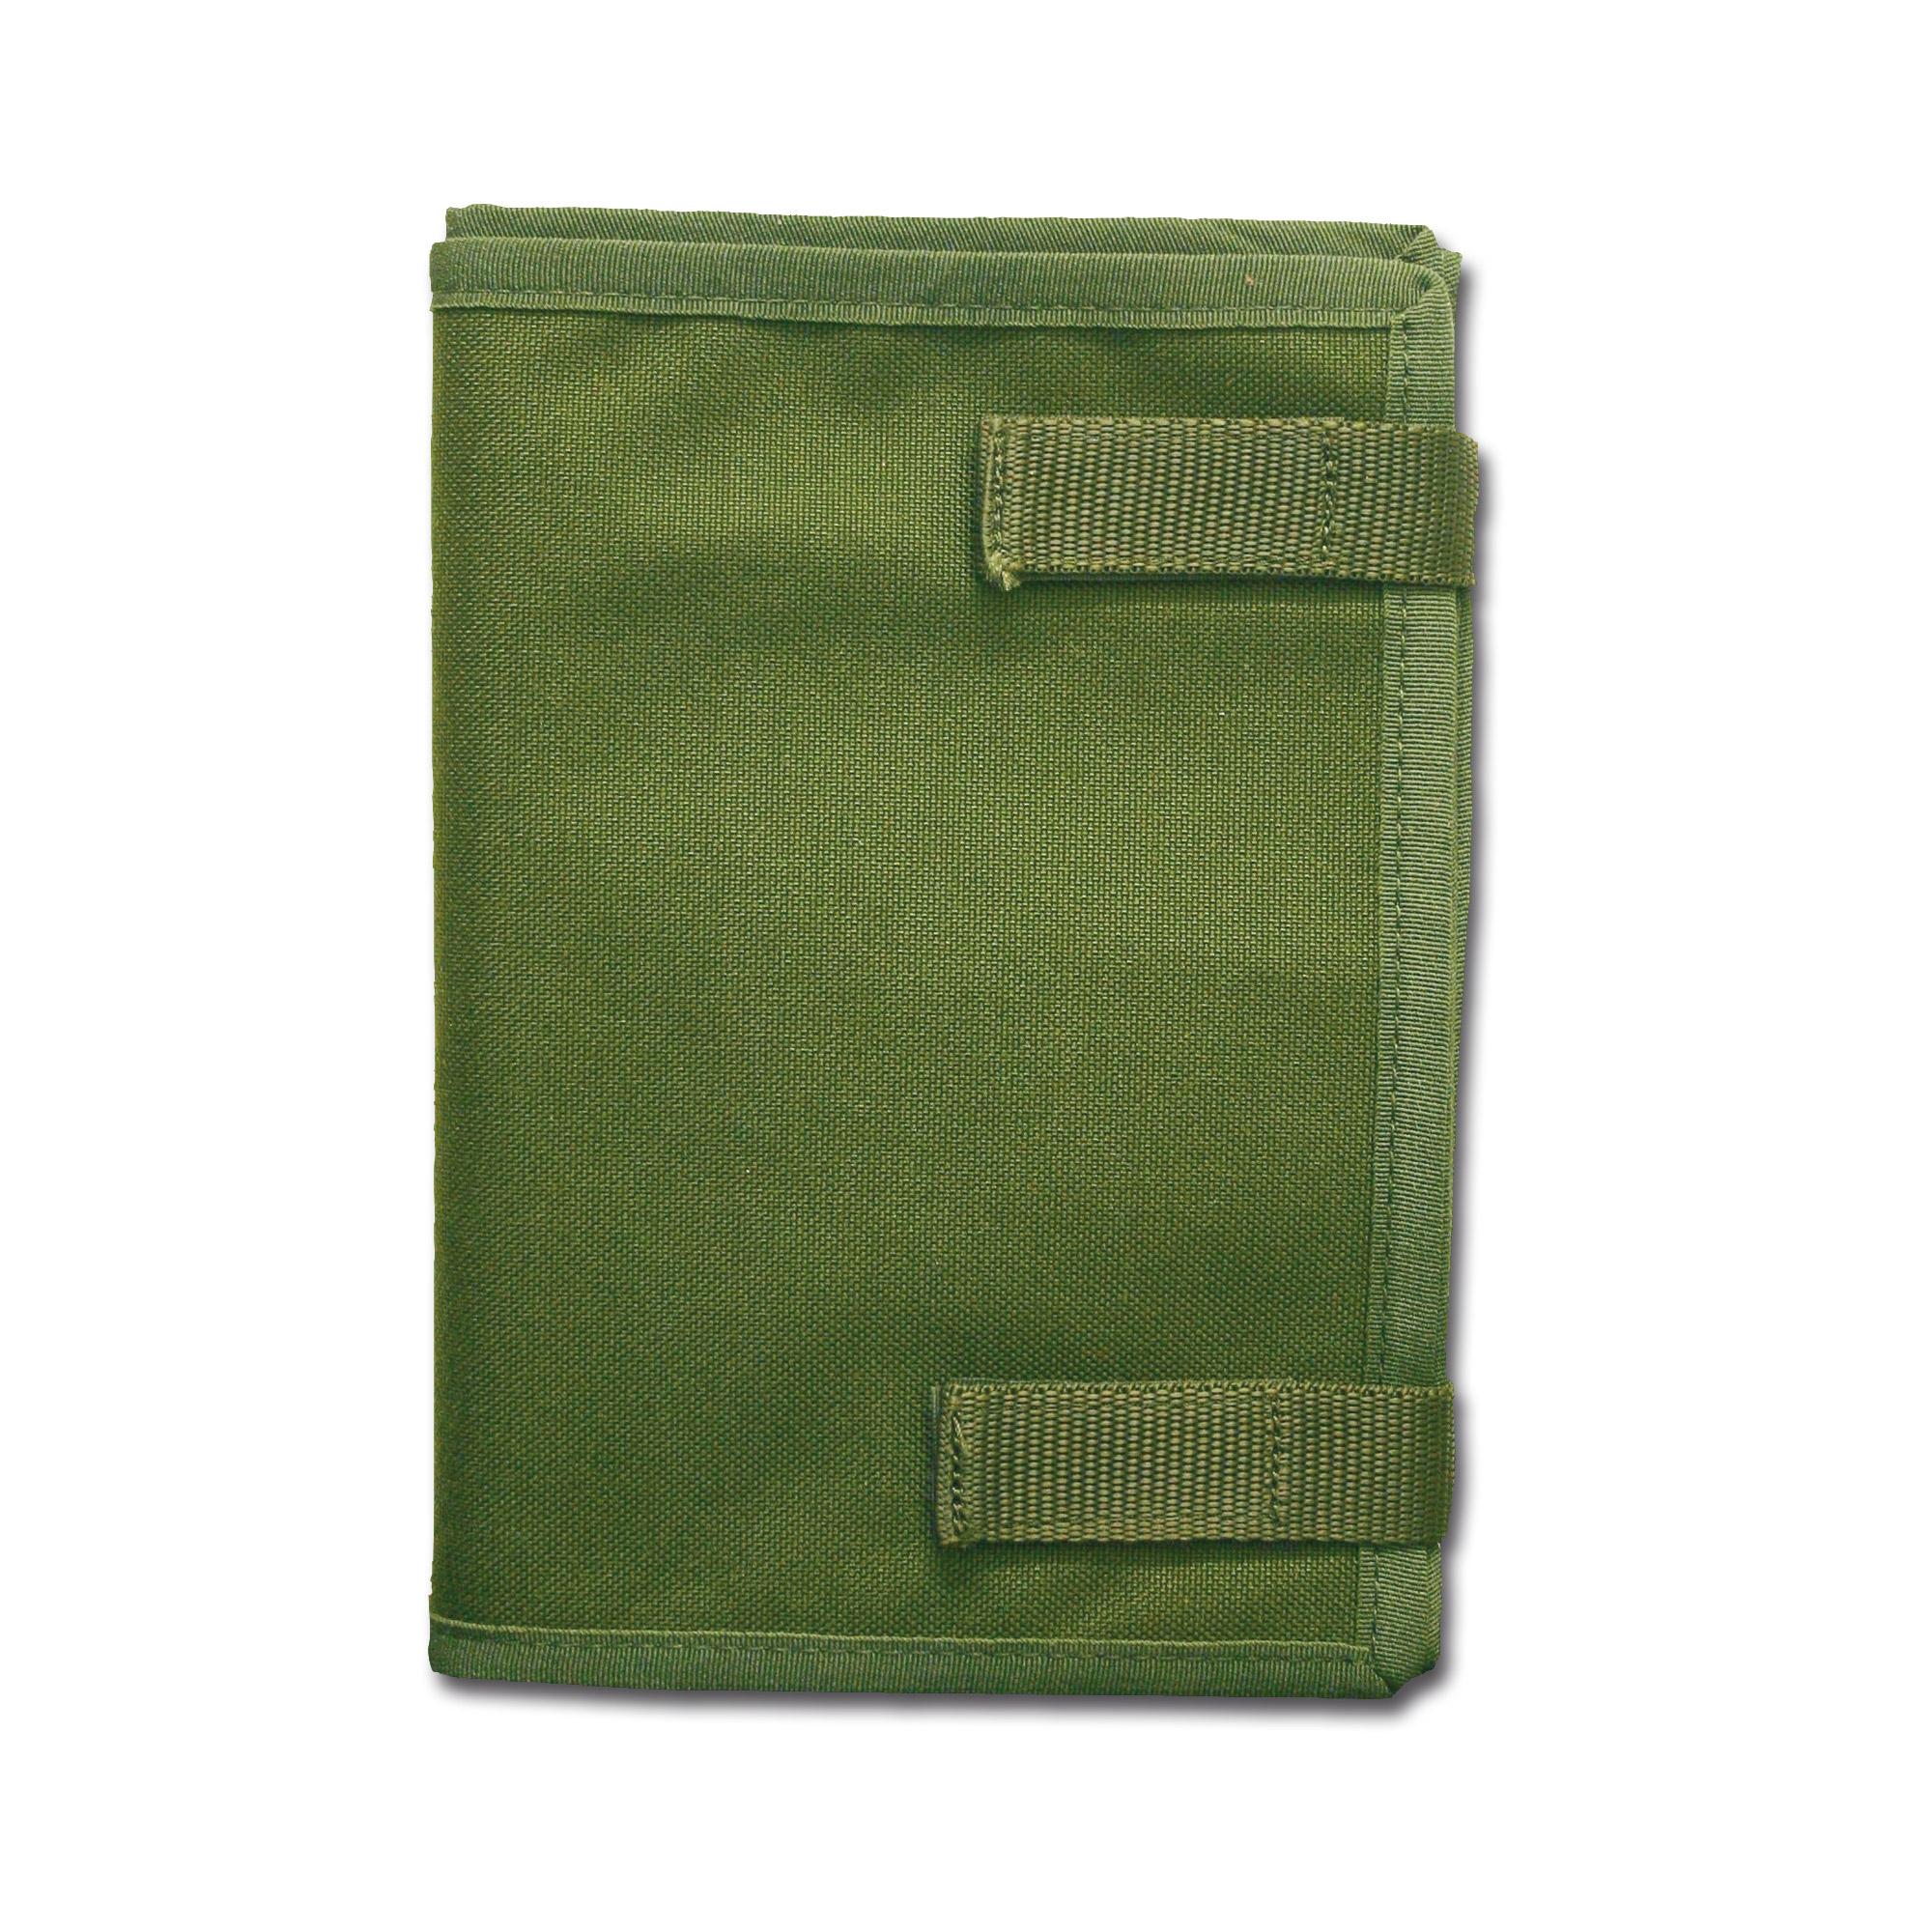 Porta documenti, TacGear, verde oliva